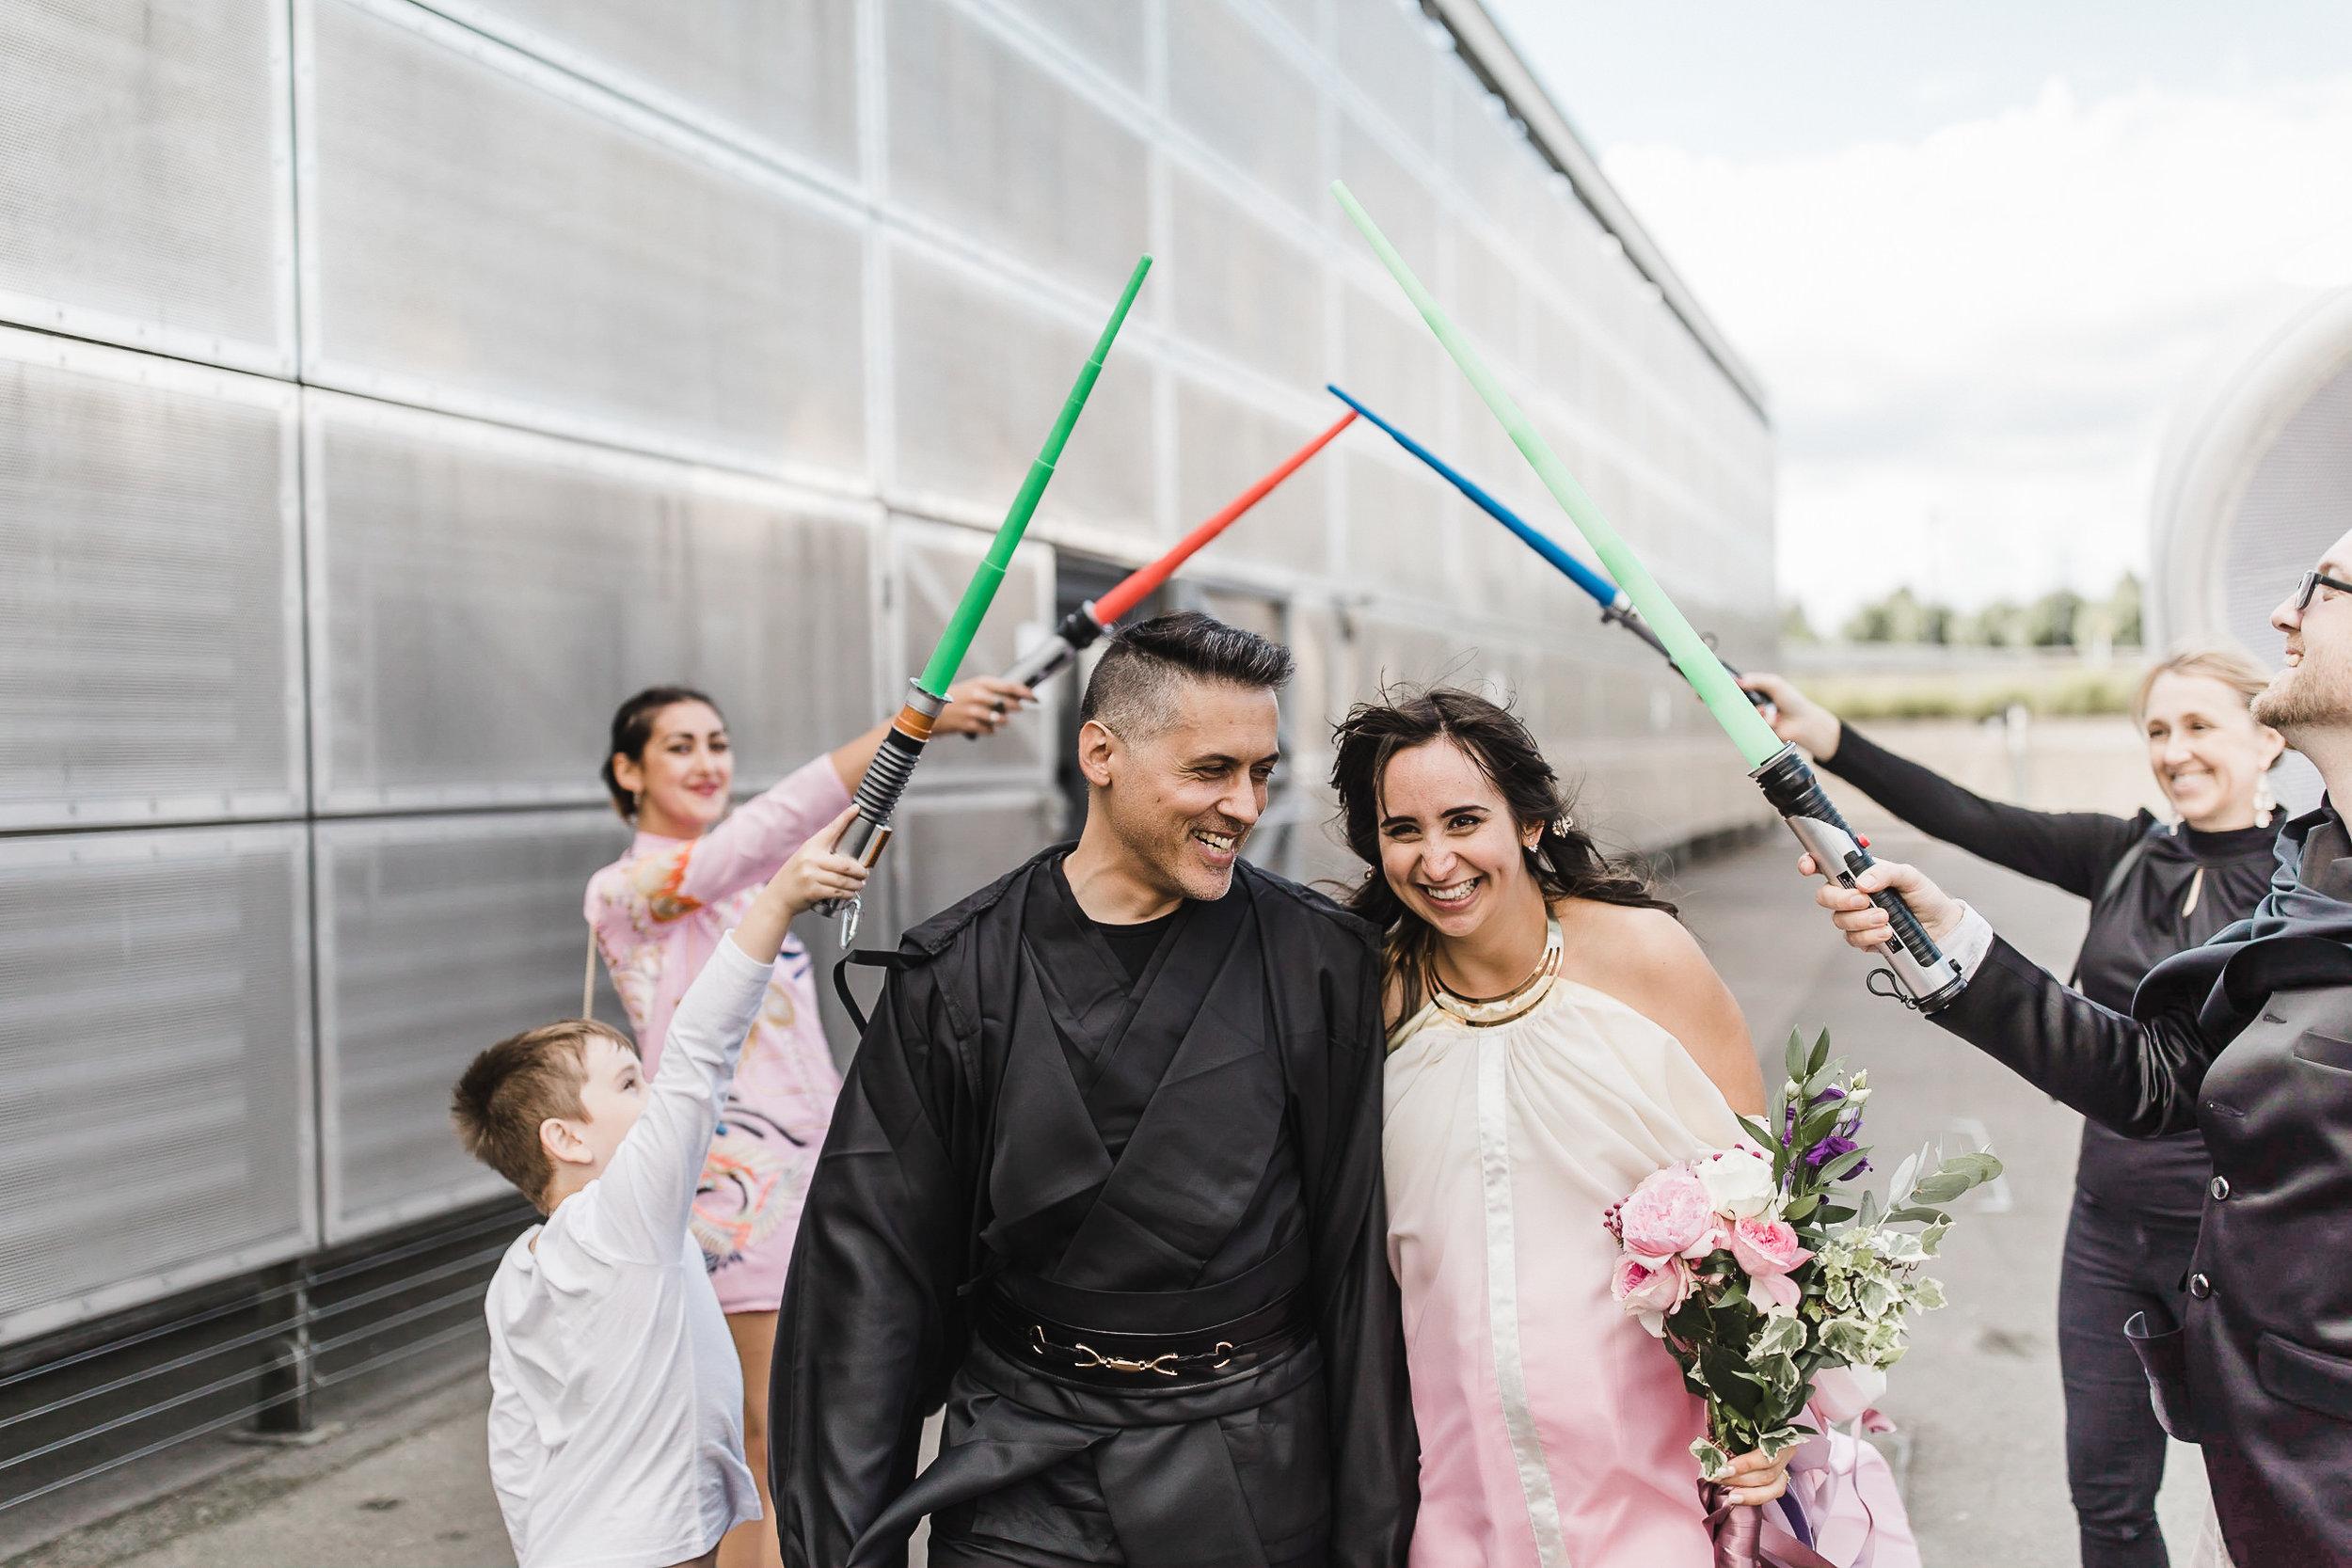 Space_Centre_Wedding_044.jpg